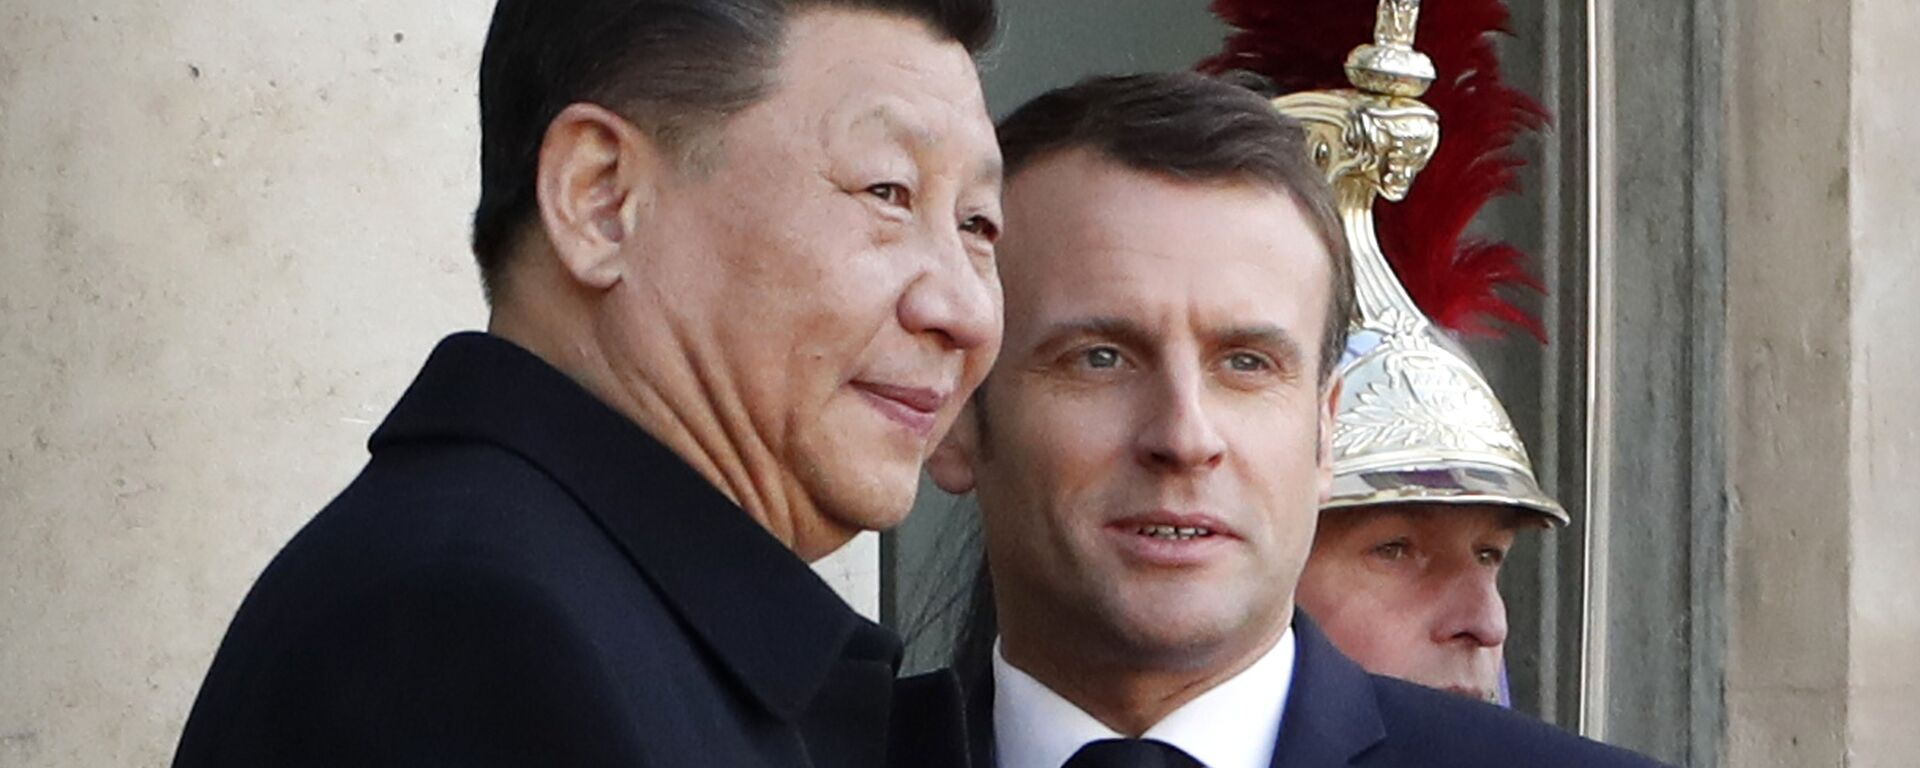 Emmanuel Macron et Xi Jinping - Sputnik France, 1920, 18.01.2021